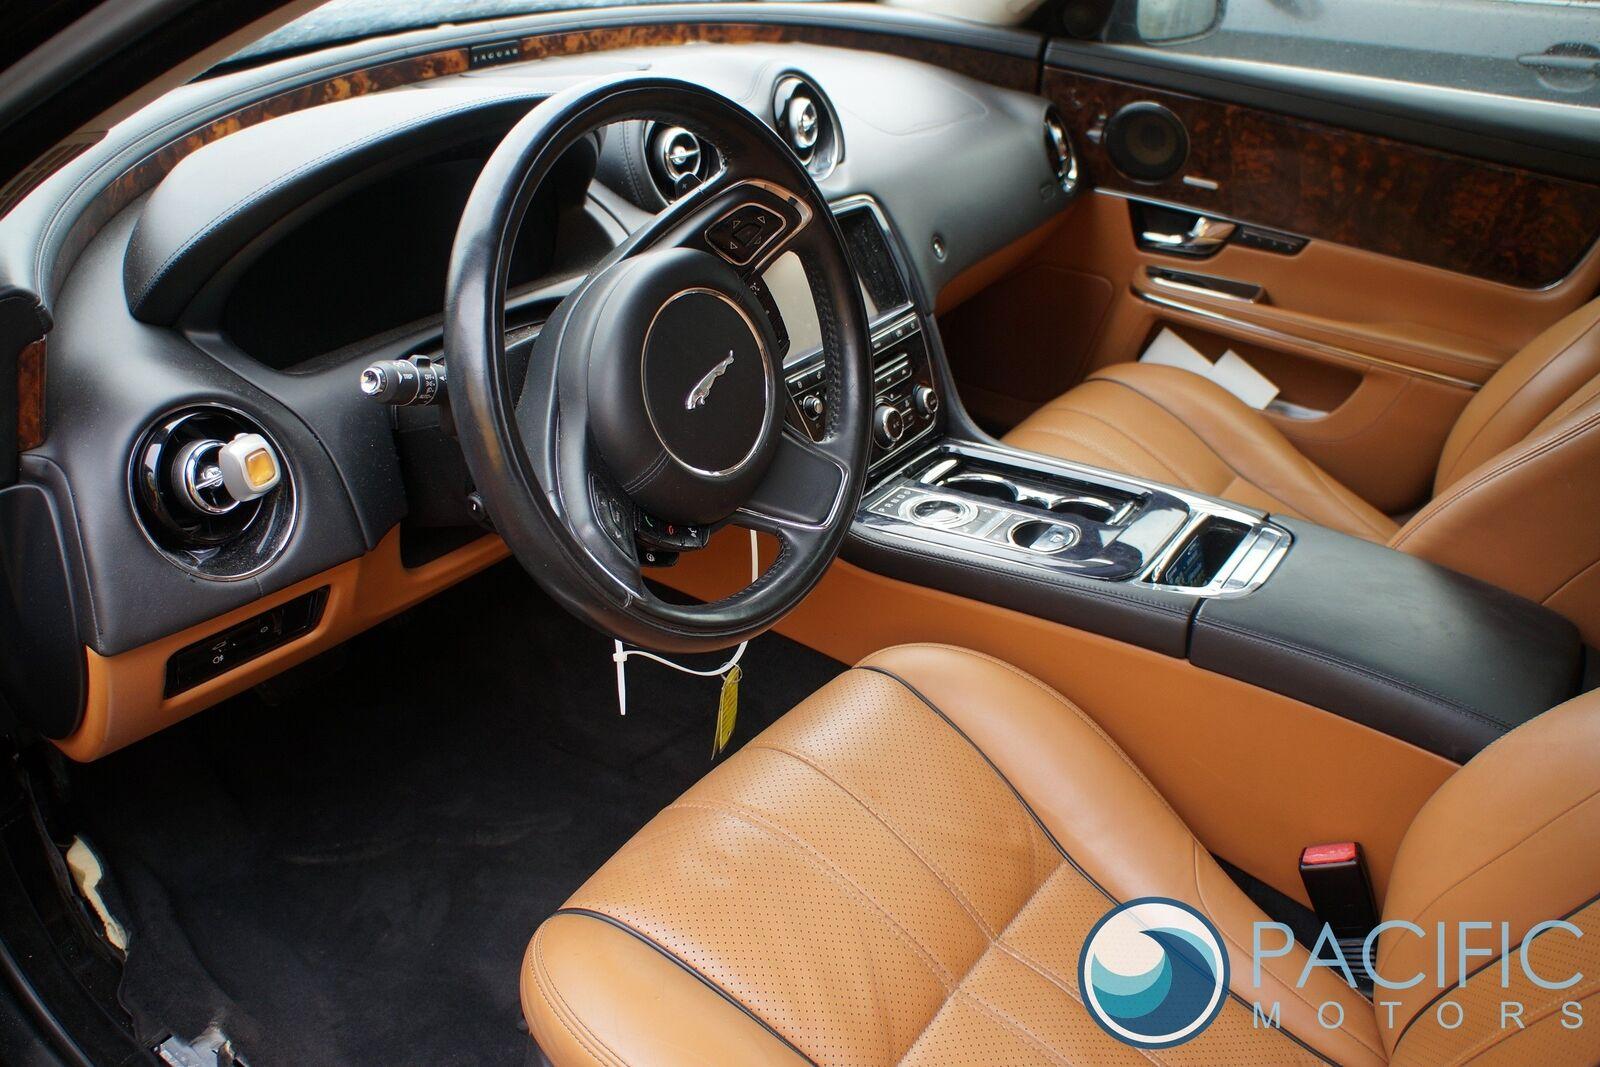 Rear Trunk Fuse Relay Box Block Aw9314a073bc Jaguar Xj Xjl X351 2011 Automotive And